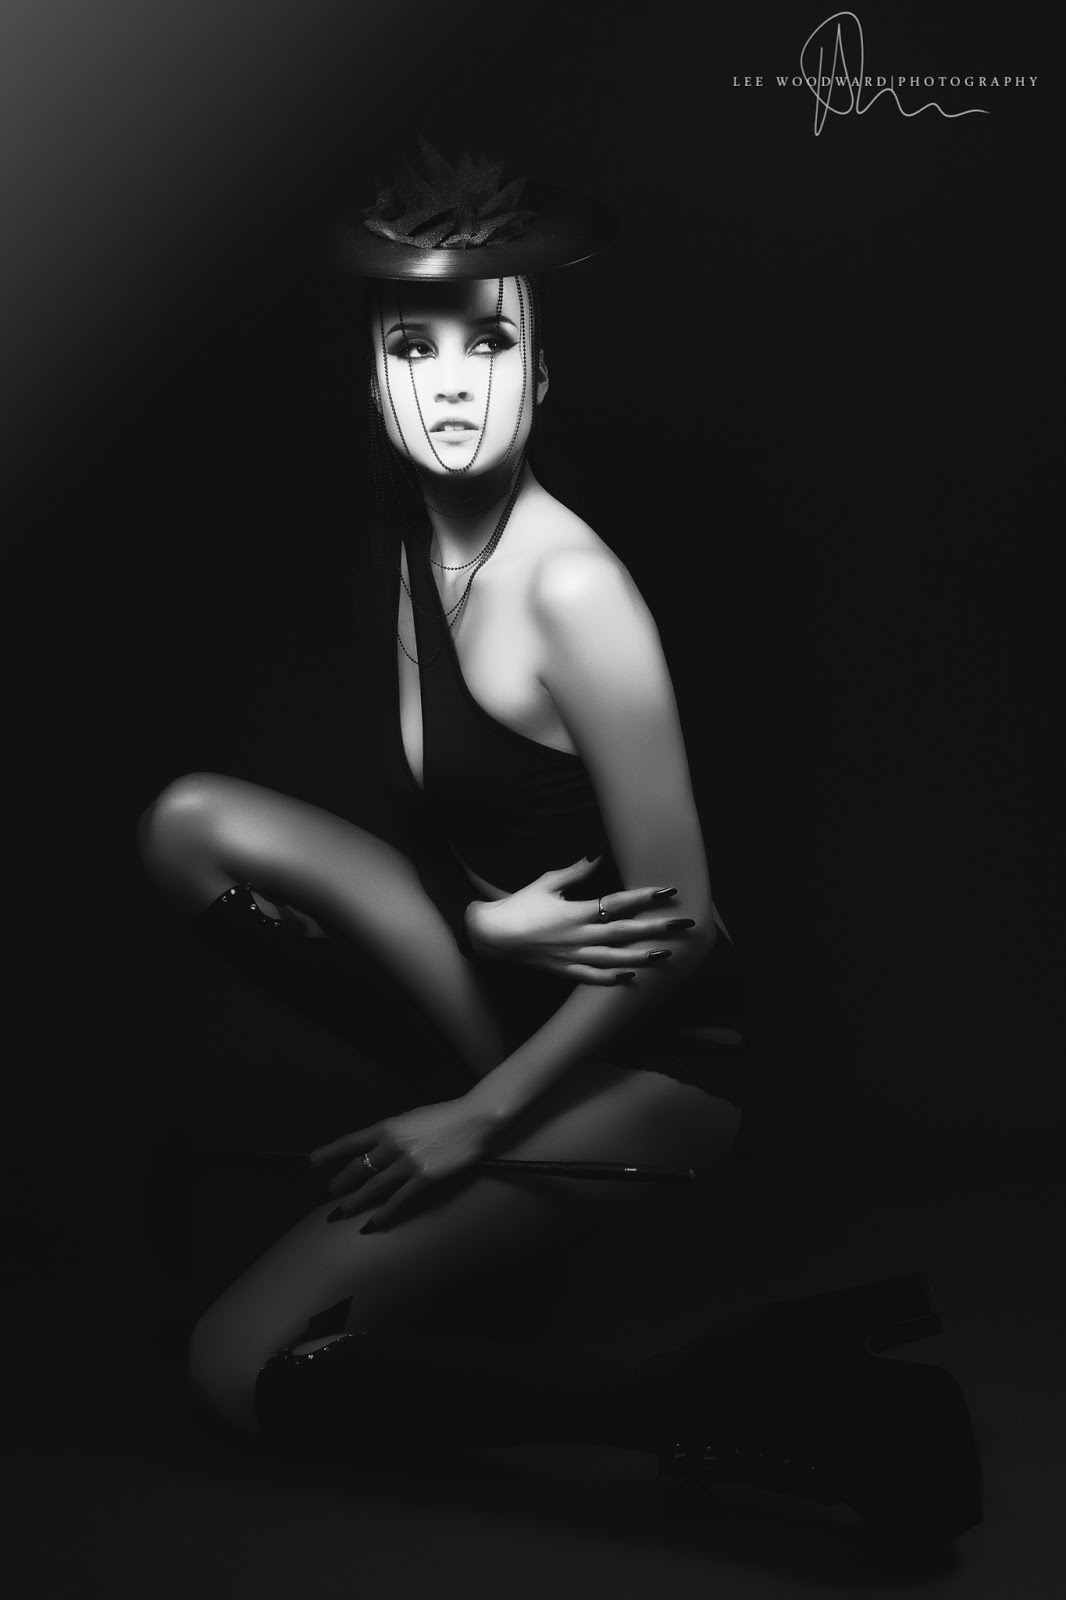 Mystic Magic, Shades Of Grey, fifty shades, fifty shades of grey, Lee Woodward Photography, photo, photography, fashion, high fashion photography, fetish, high fashion, fashion photo, dark beauty, photo shoot, glamour, style, vogue, super hero, batman, Not Naked, futuristic fashion, black and white photo,